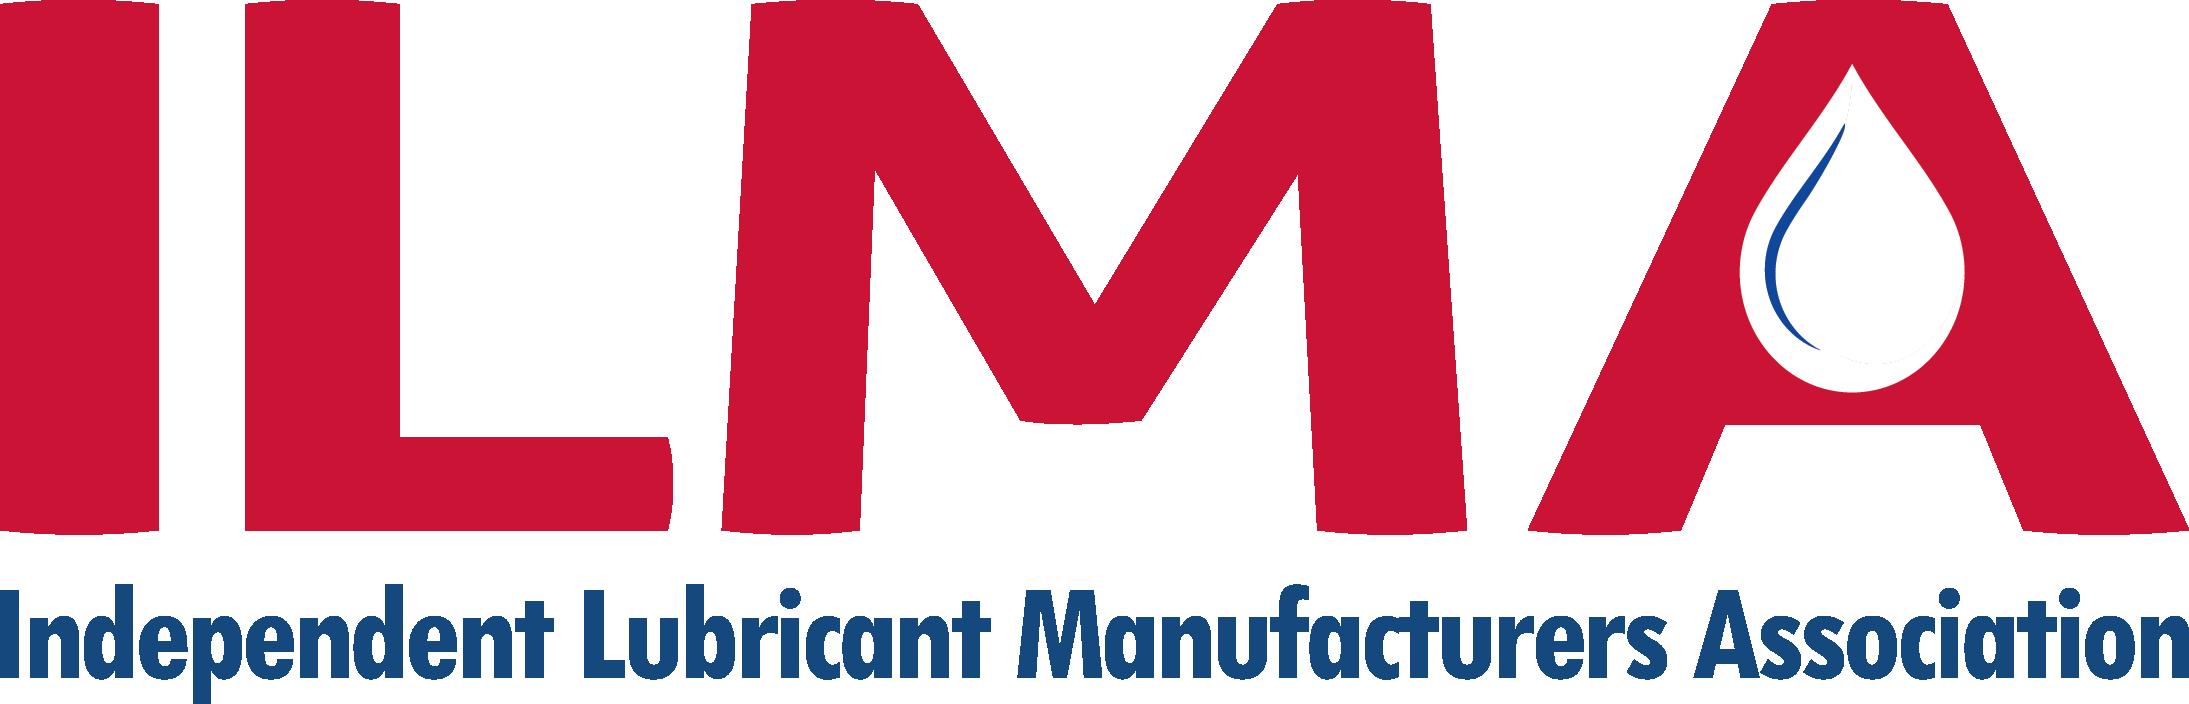 ILMA-Logo